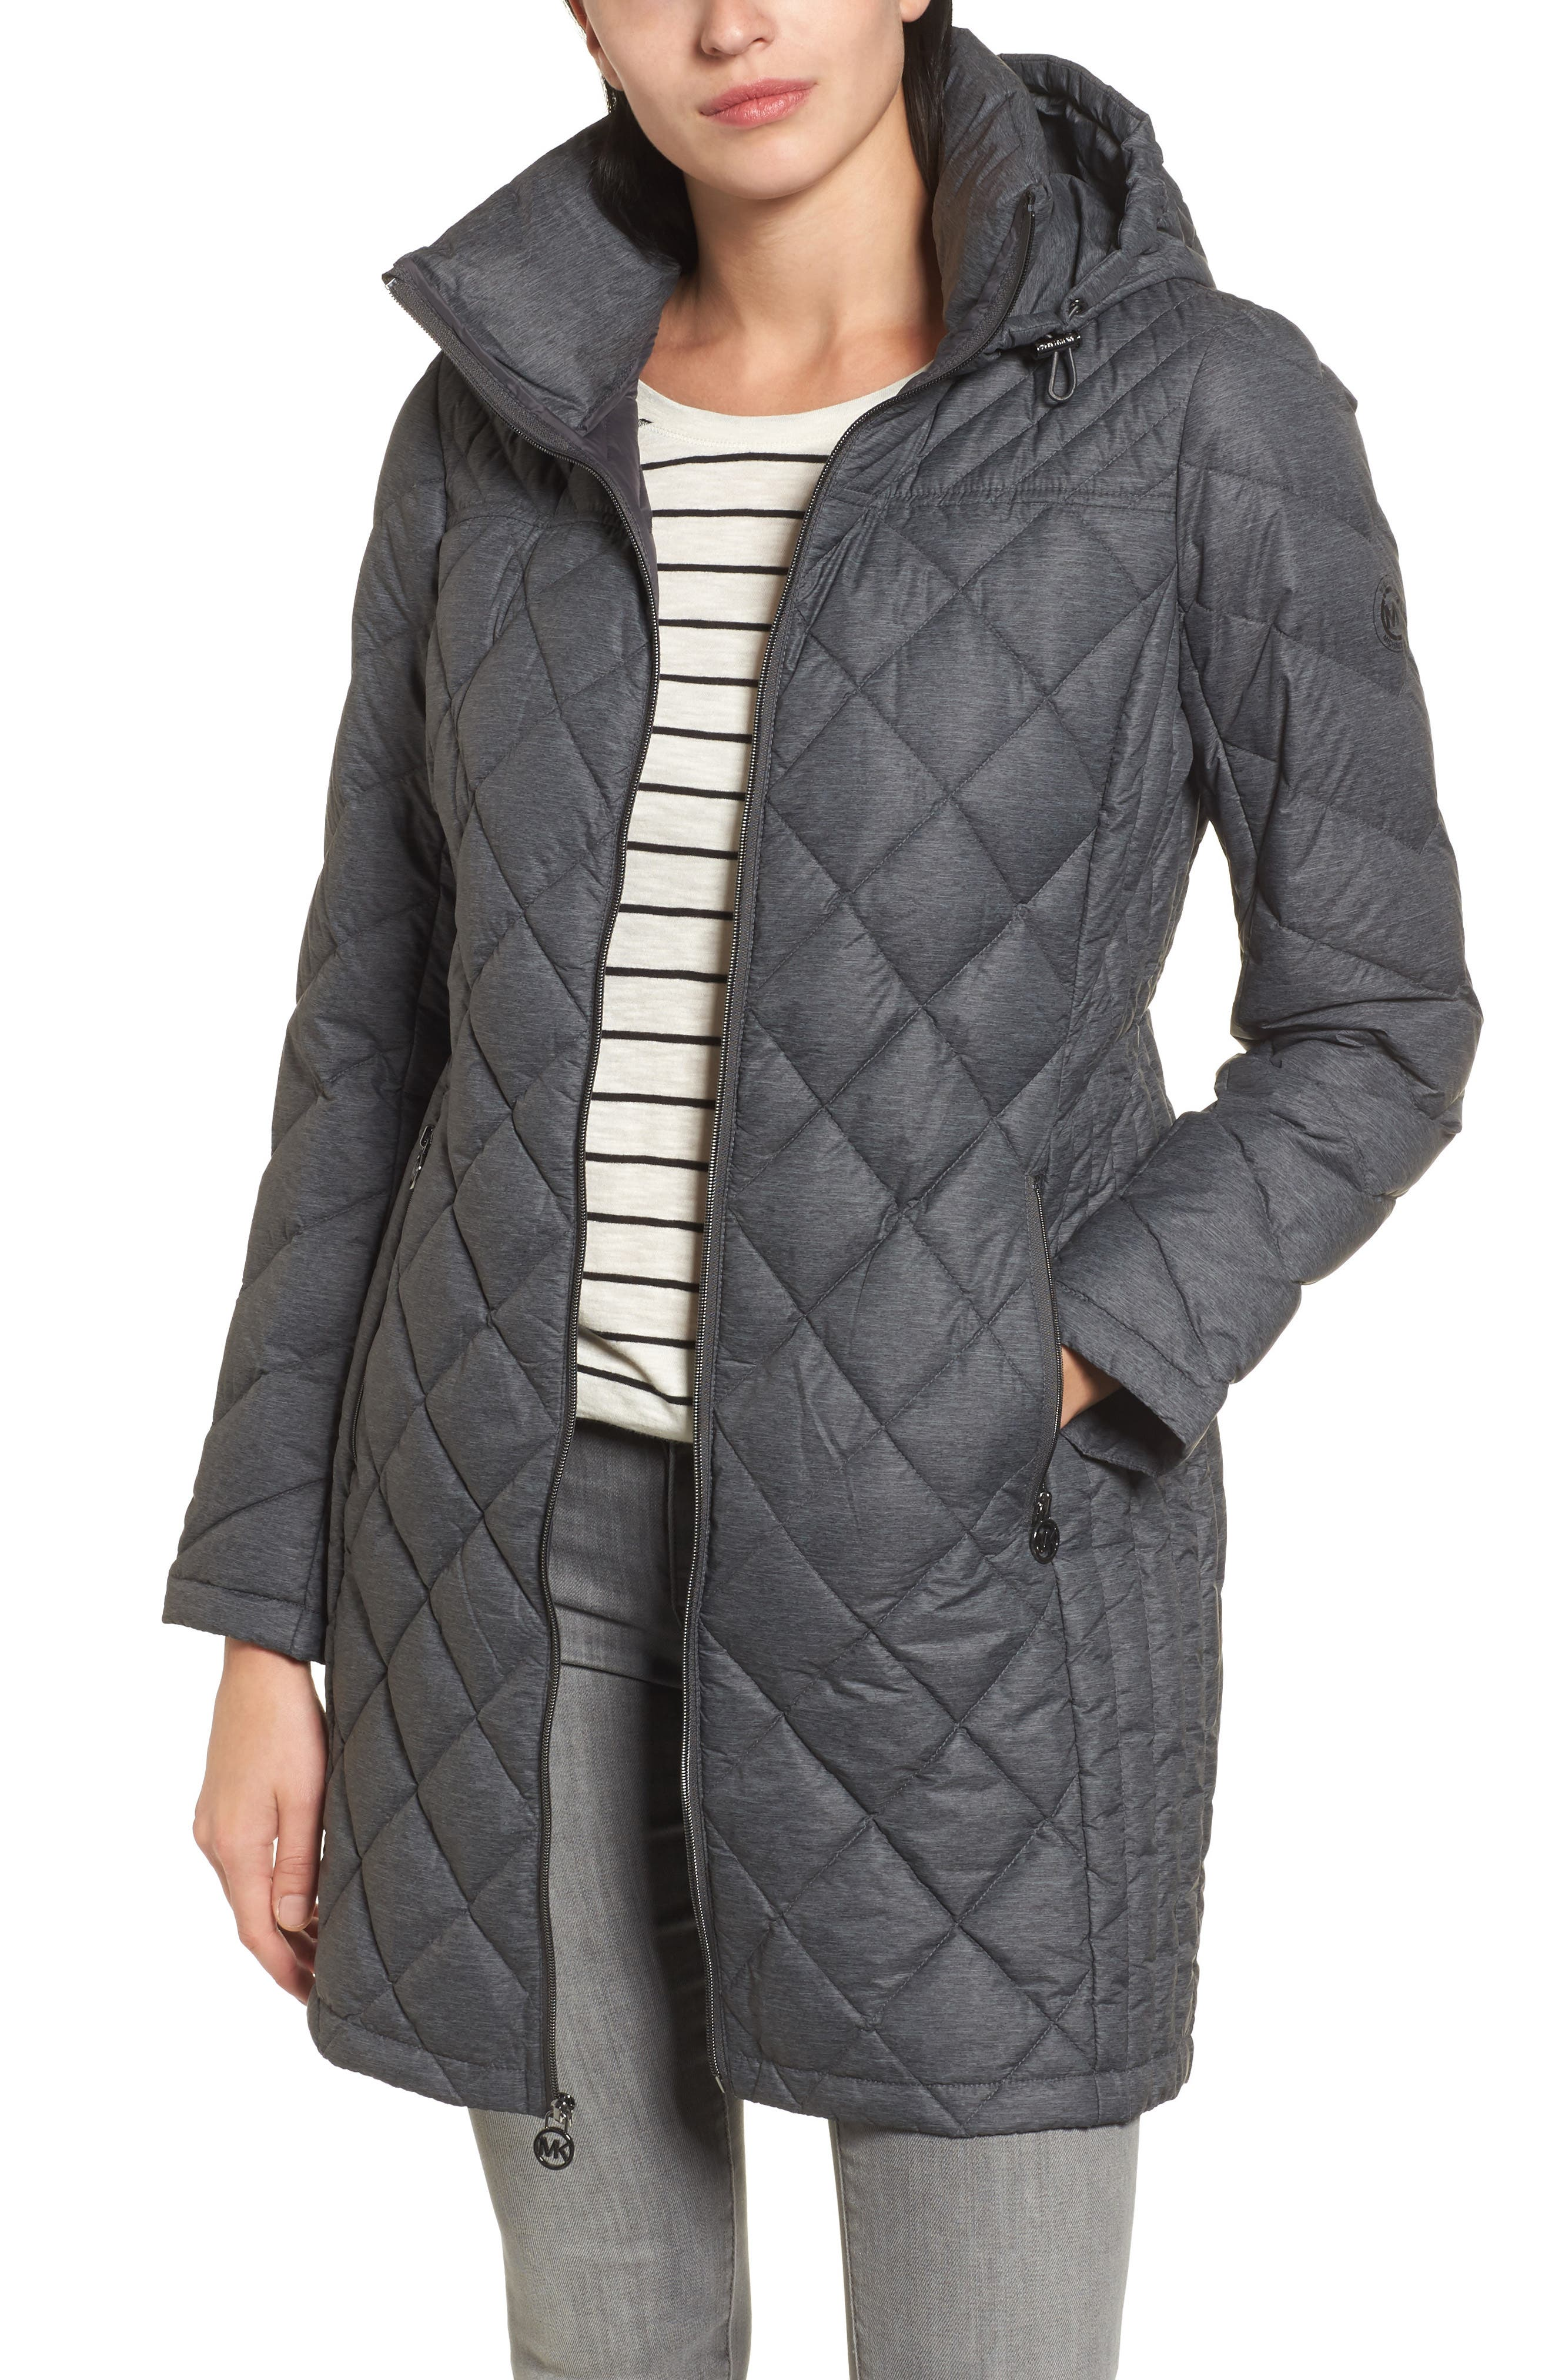 MICHAEL Michael Kors Logo Packable Puffer Coat with Detachable Hood (Regular & Petite)